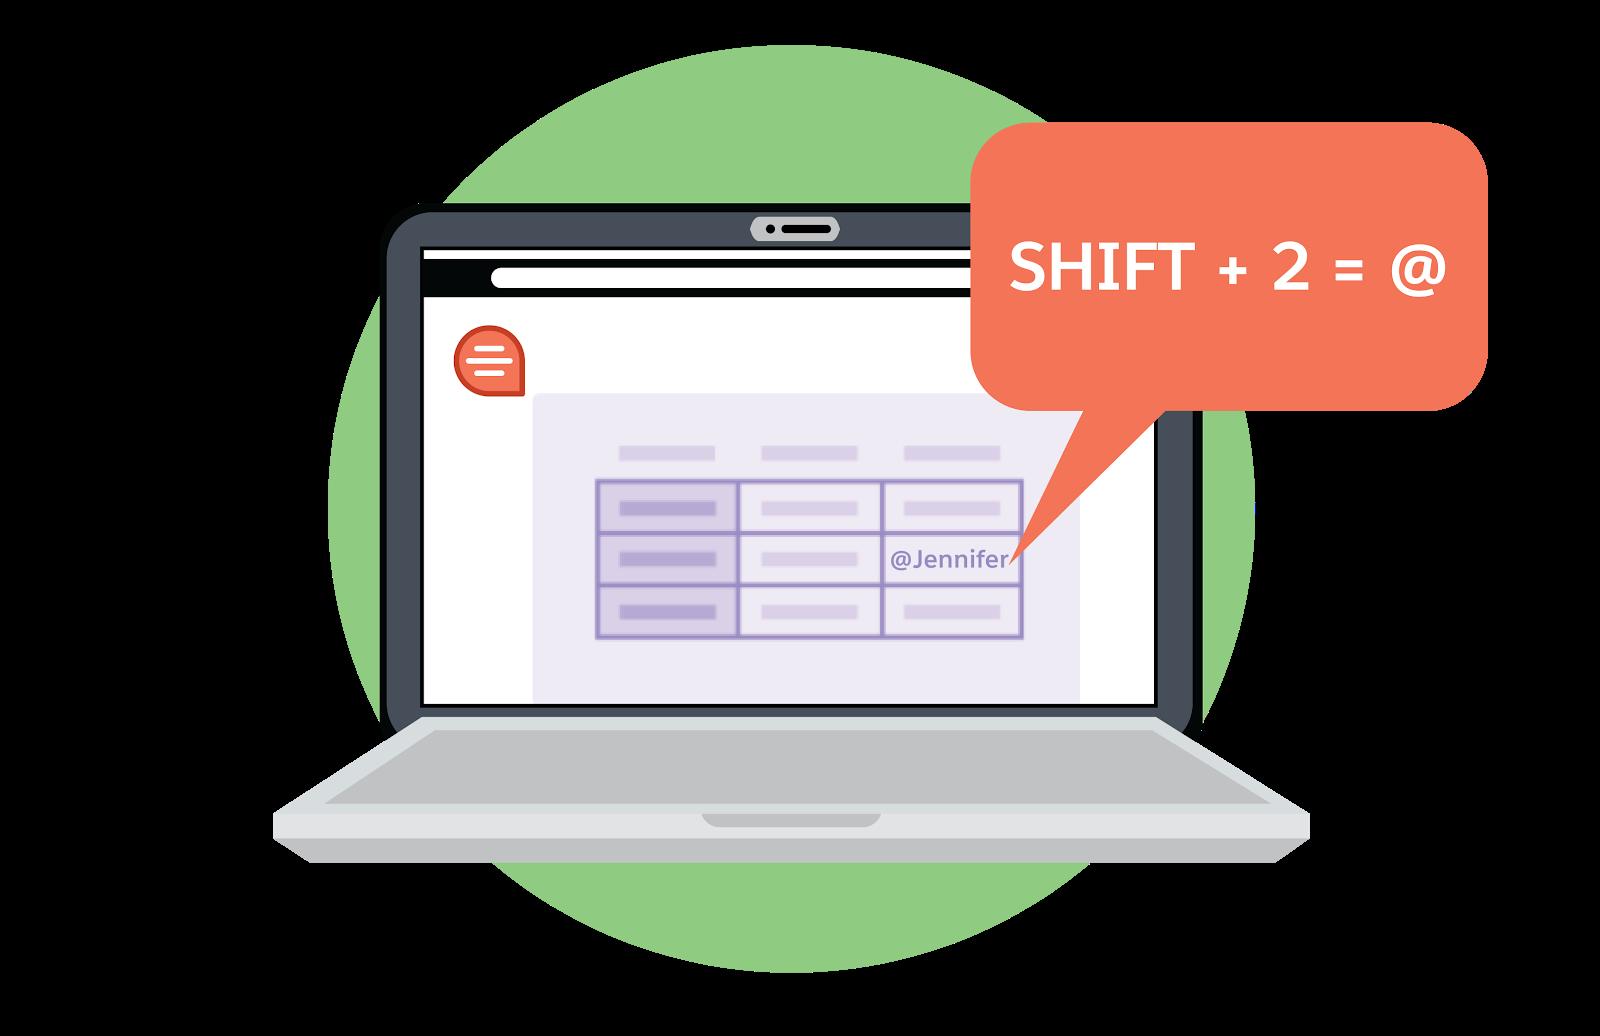 Tela do laptop mostrando shift+2=@.